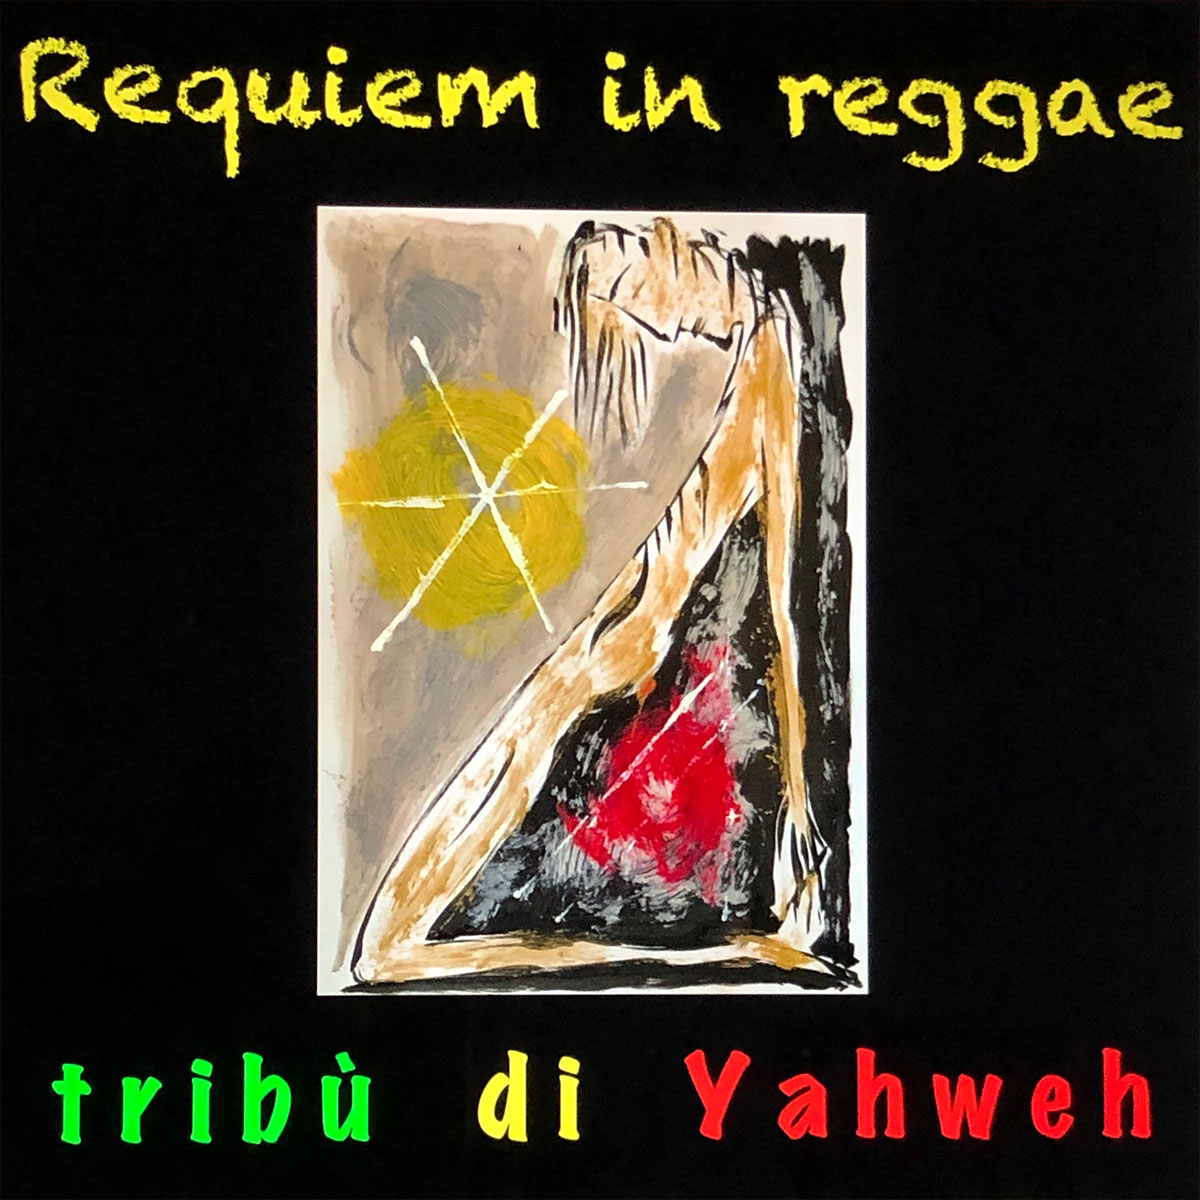 http://www.tribudiyahweh.com/wp/wp-content/uploads/2019/02/Requiem-in-reggae.jpg